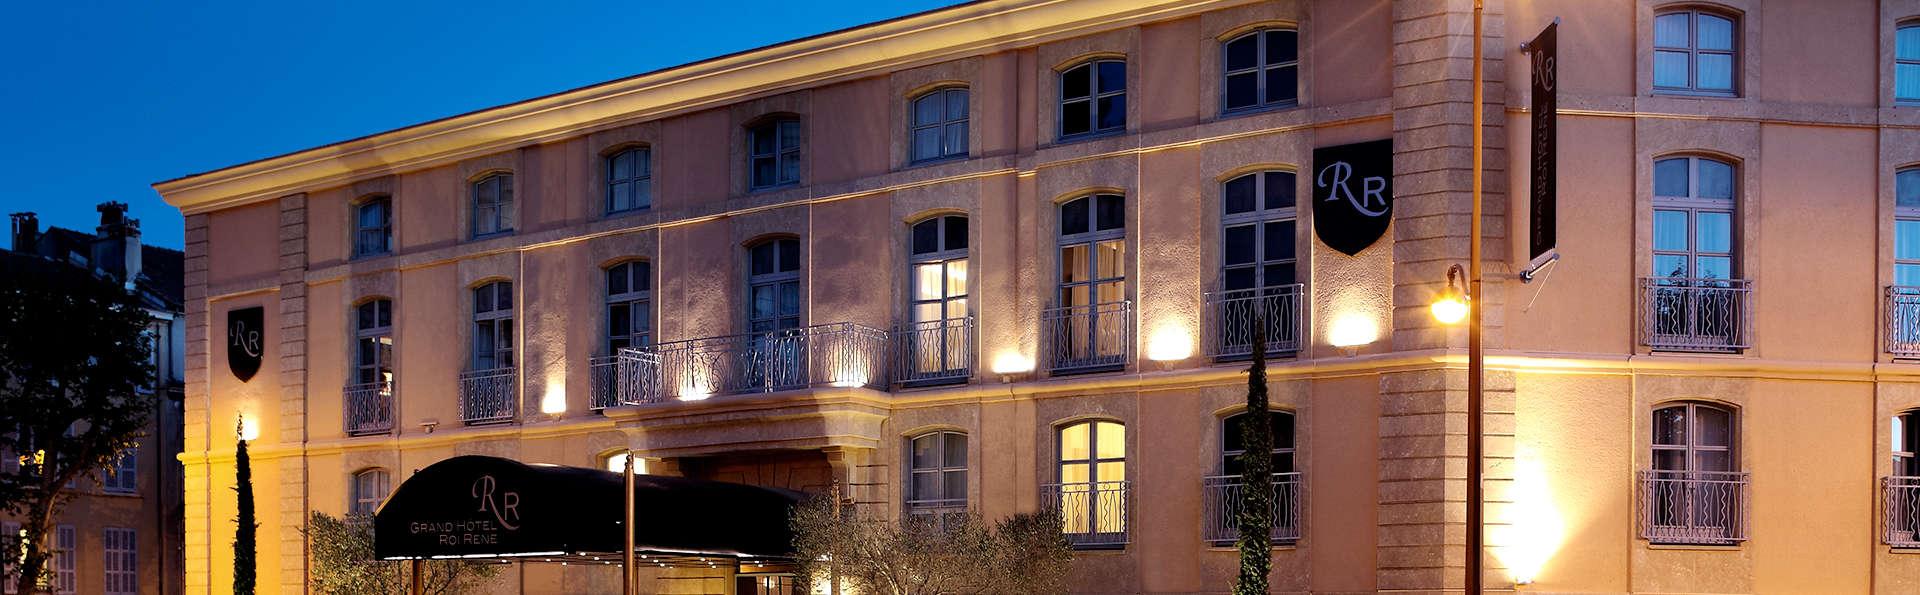 Grand Hôtel Roi René Aix-en-Provence Centre Mgallery - Edit_Front2.jpg